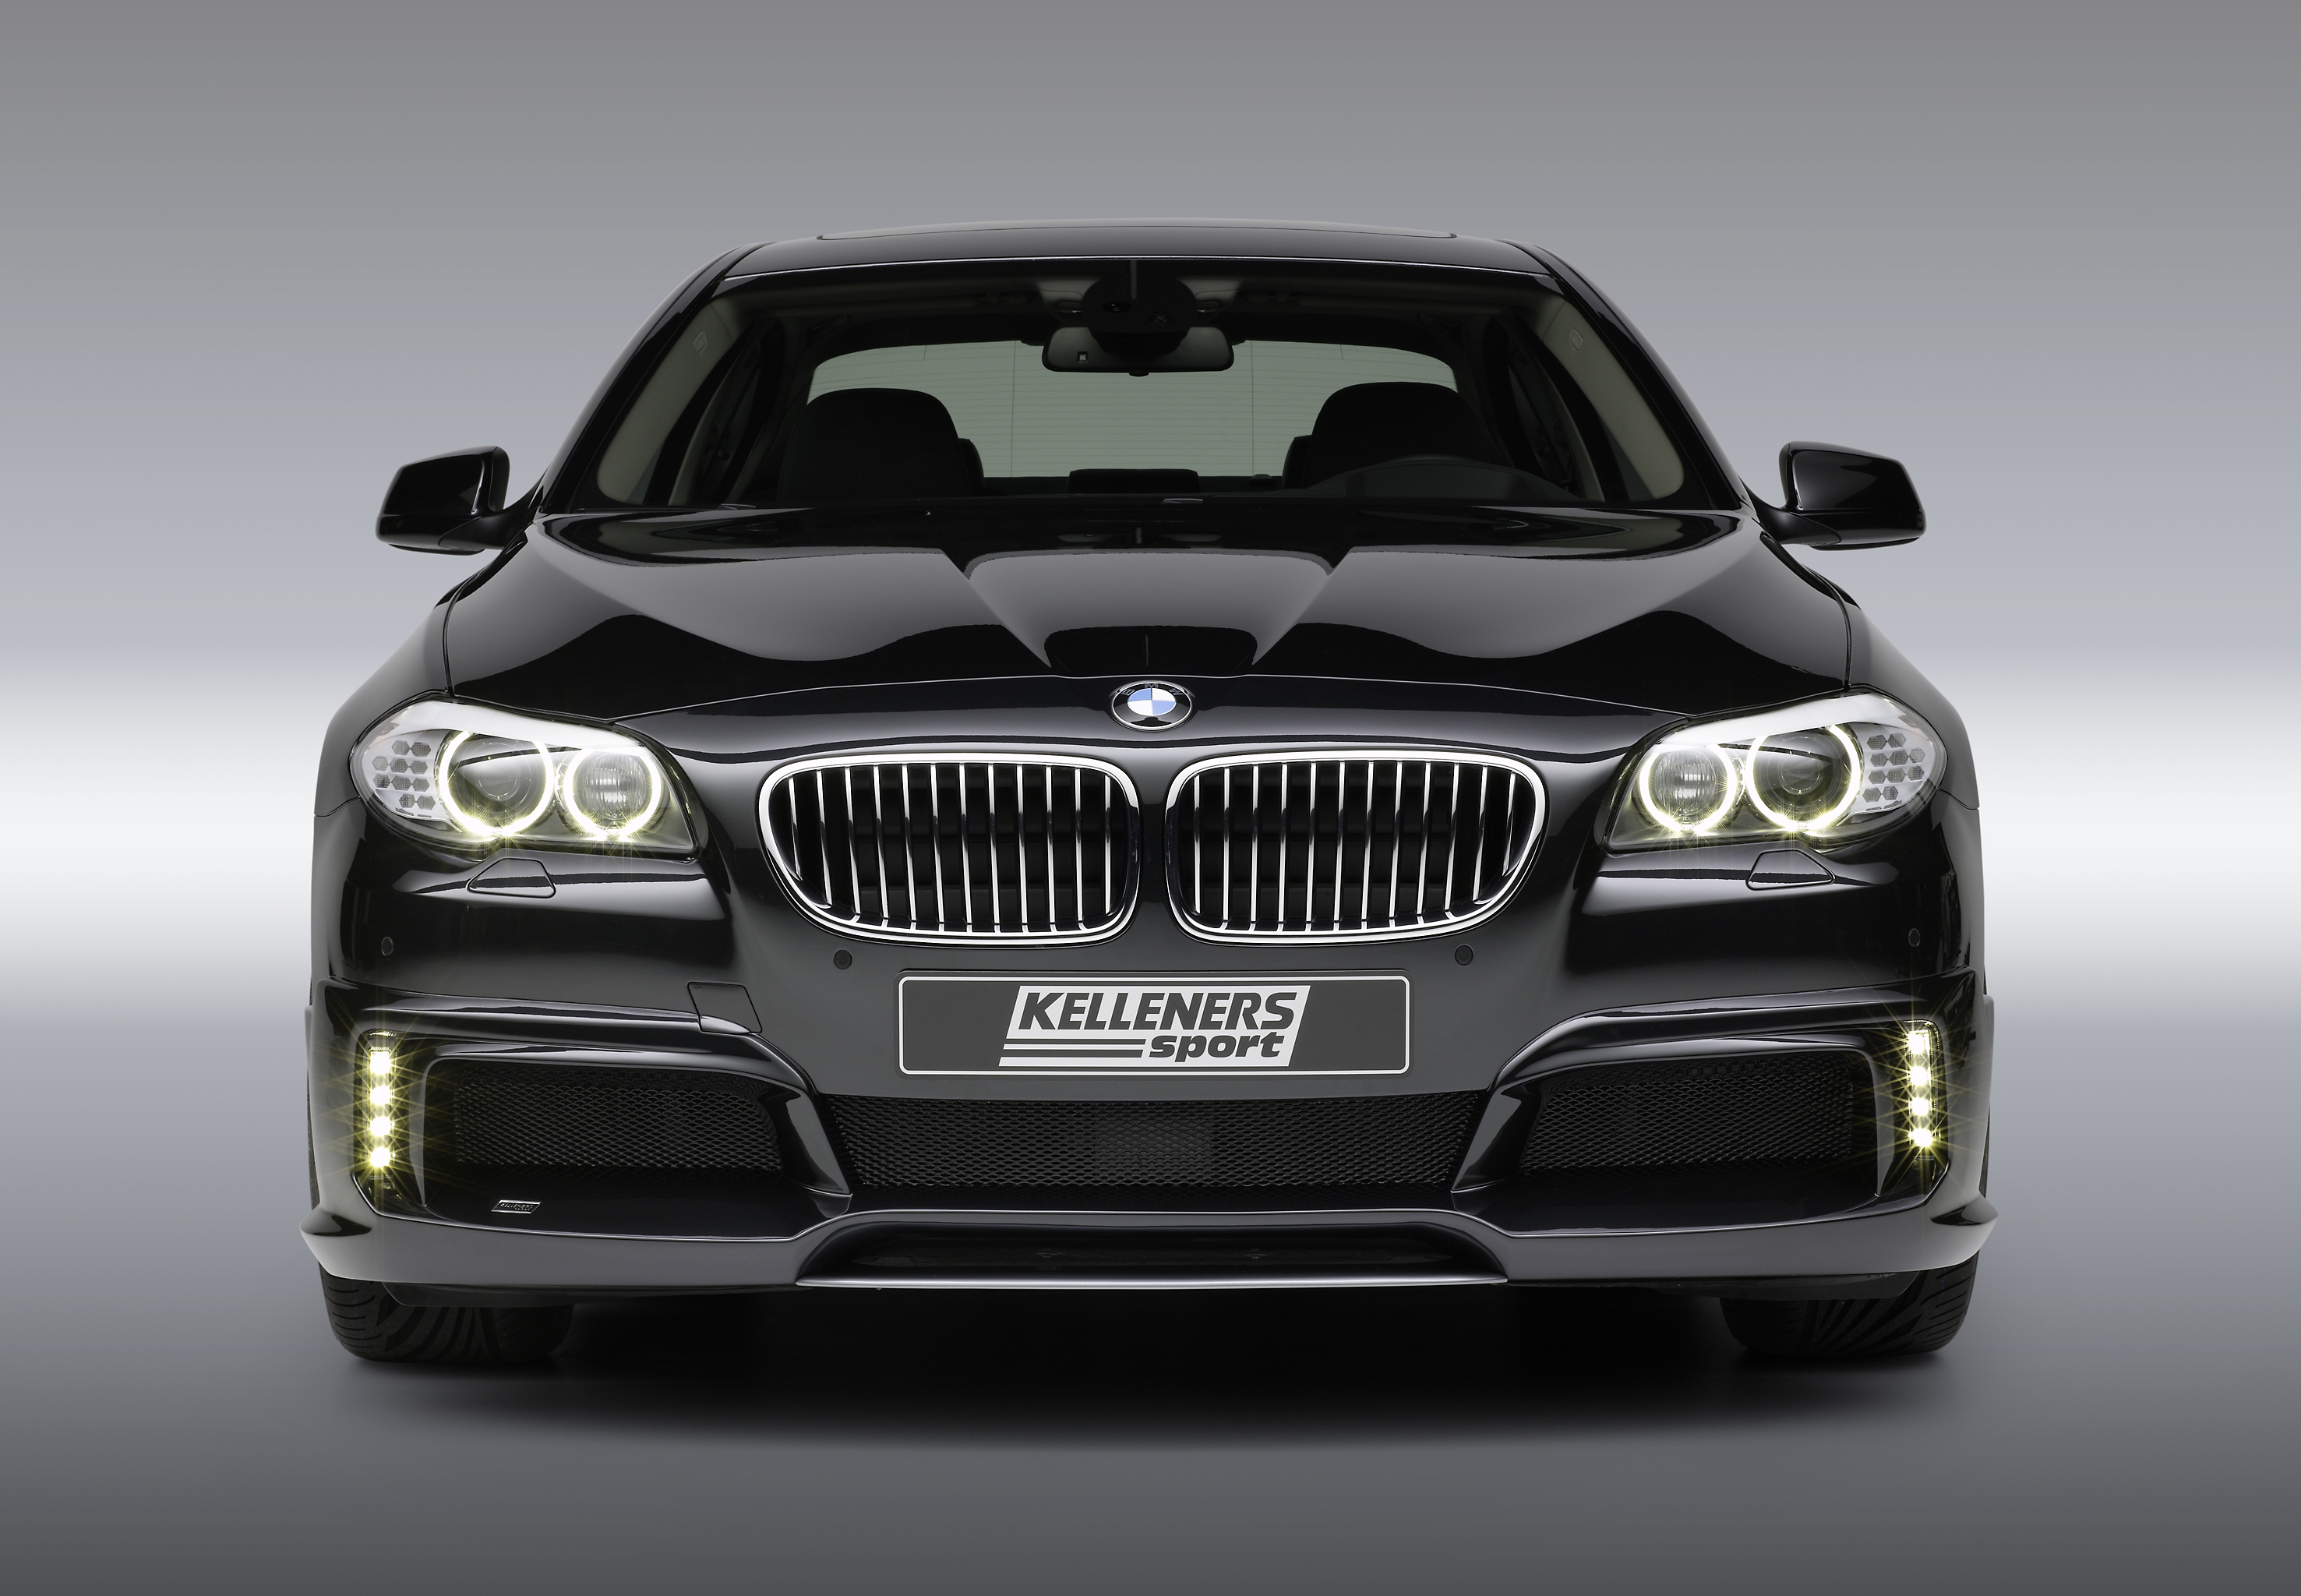 BMW 5er 535i F10 Kelleners Sport